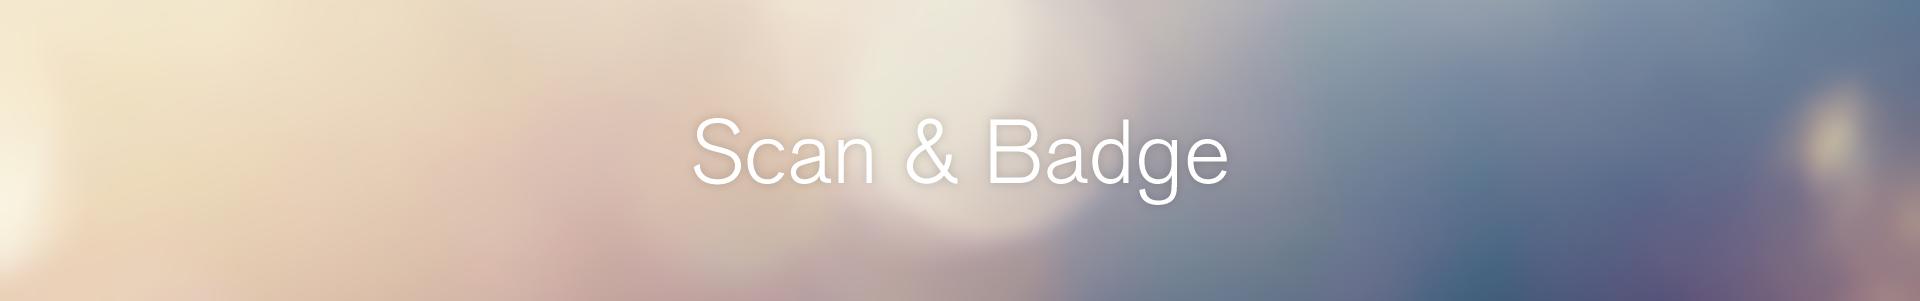 Scan & badge 2020